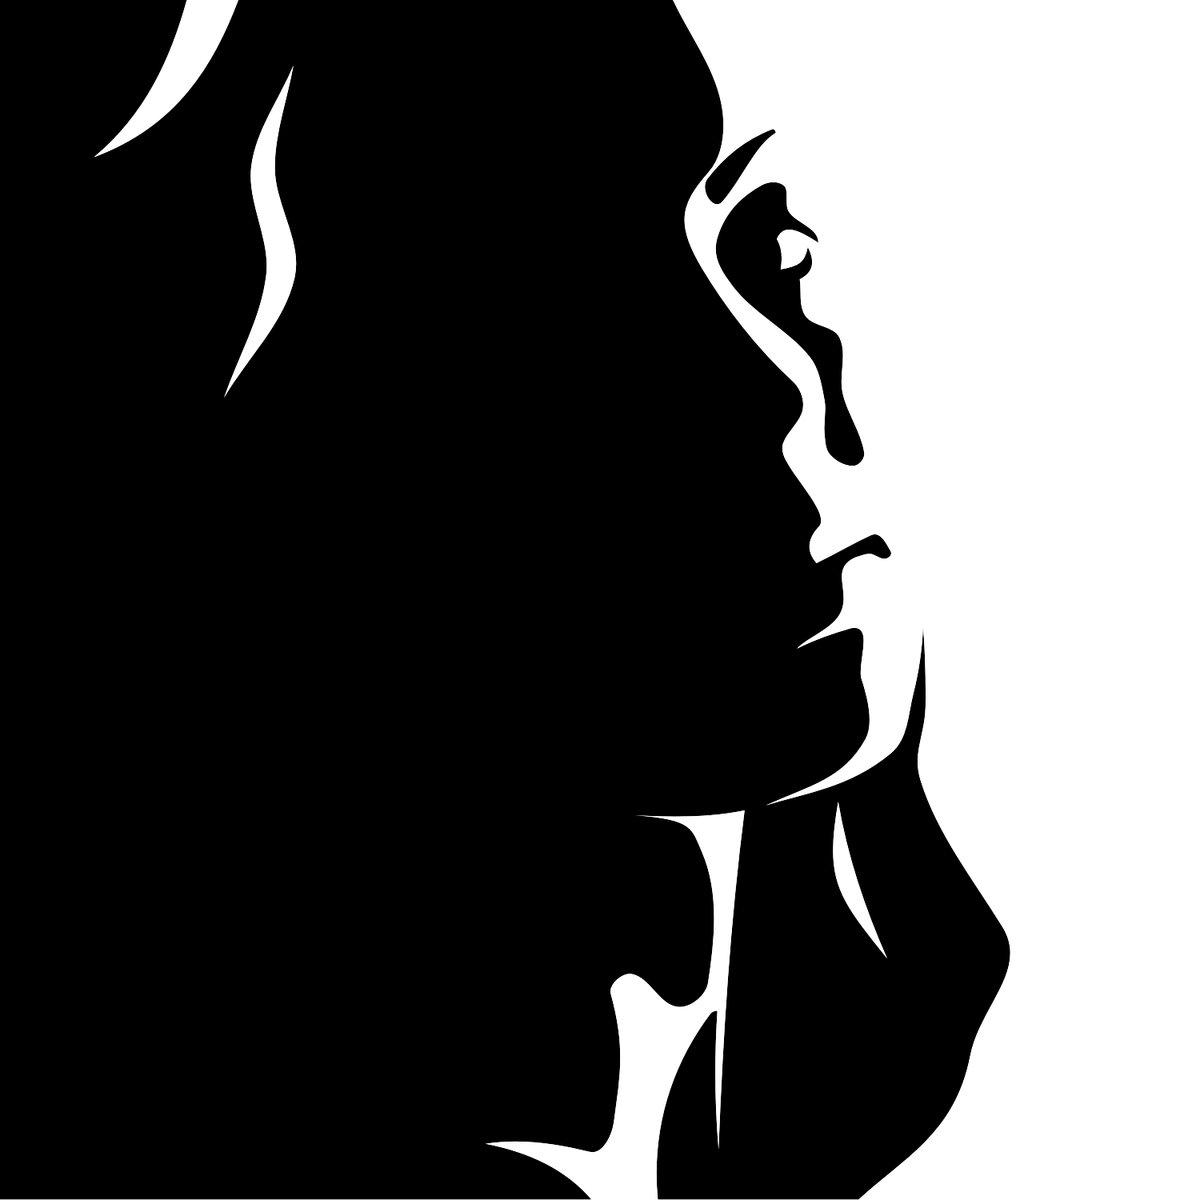 Черно белый силуэт девочки